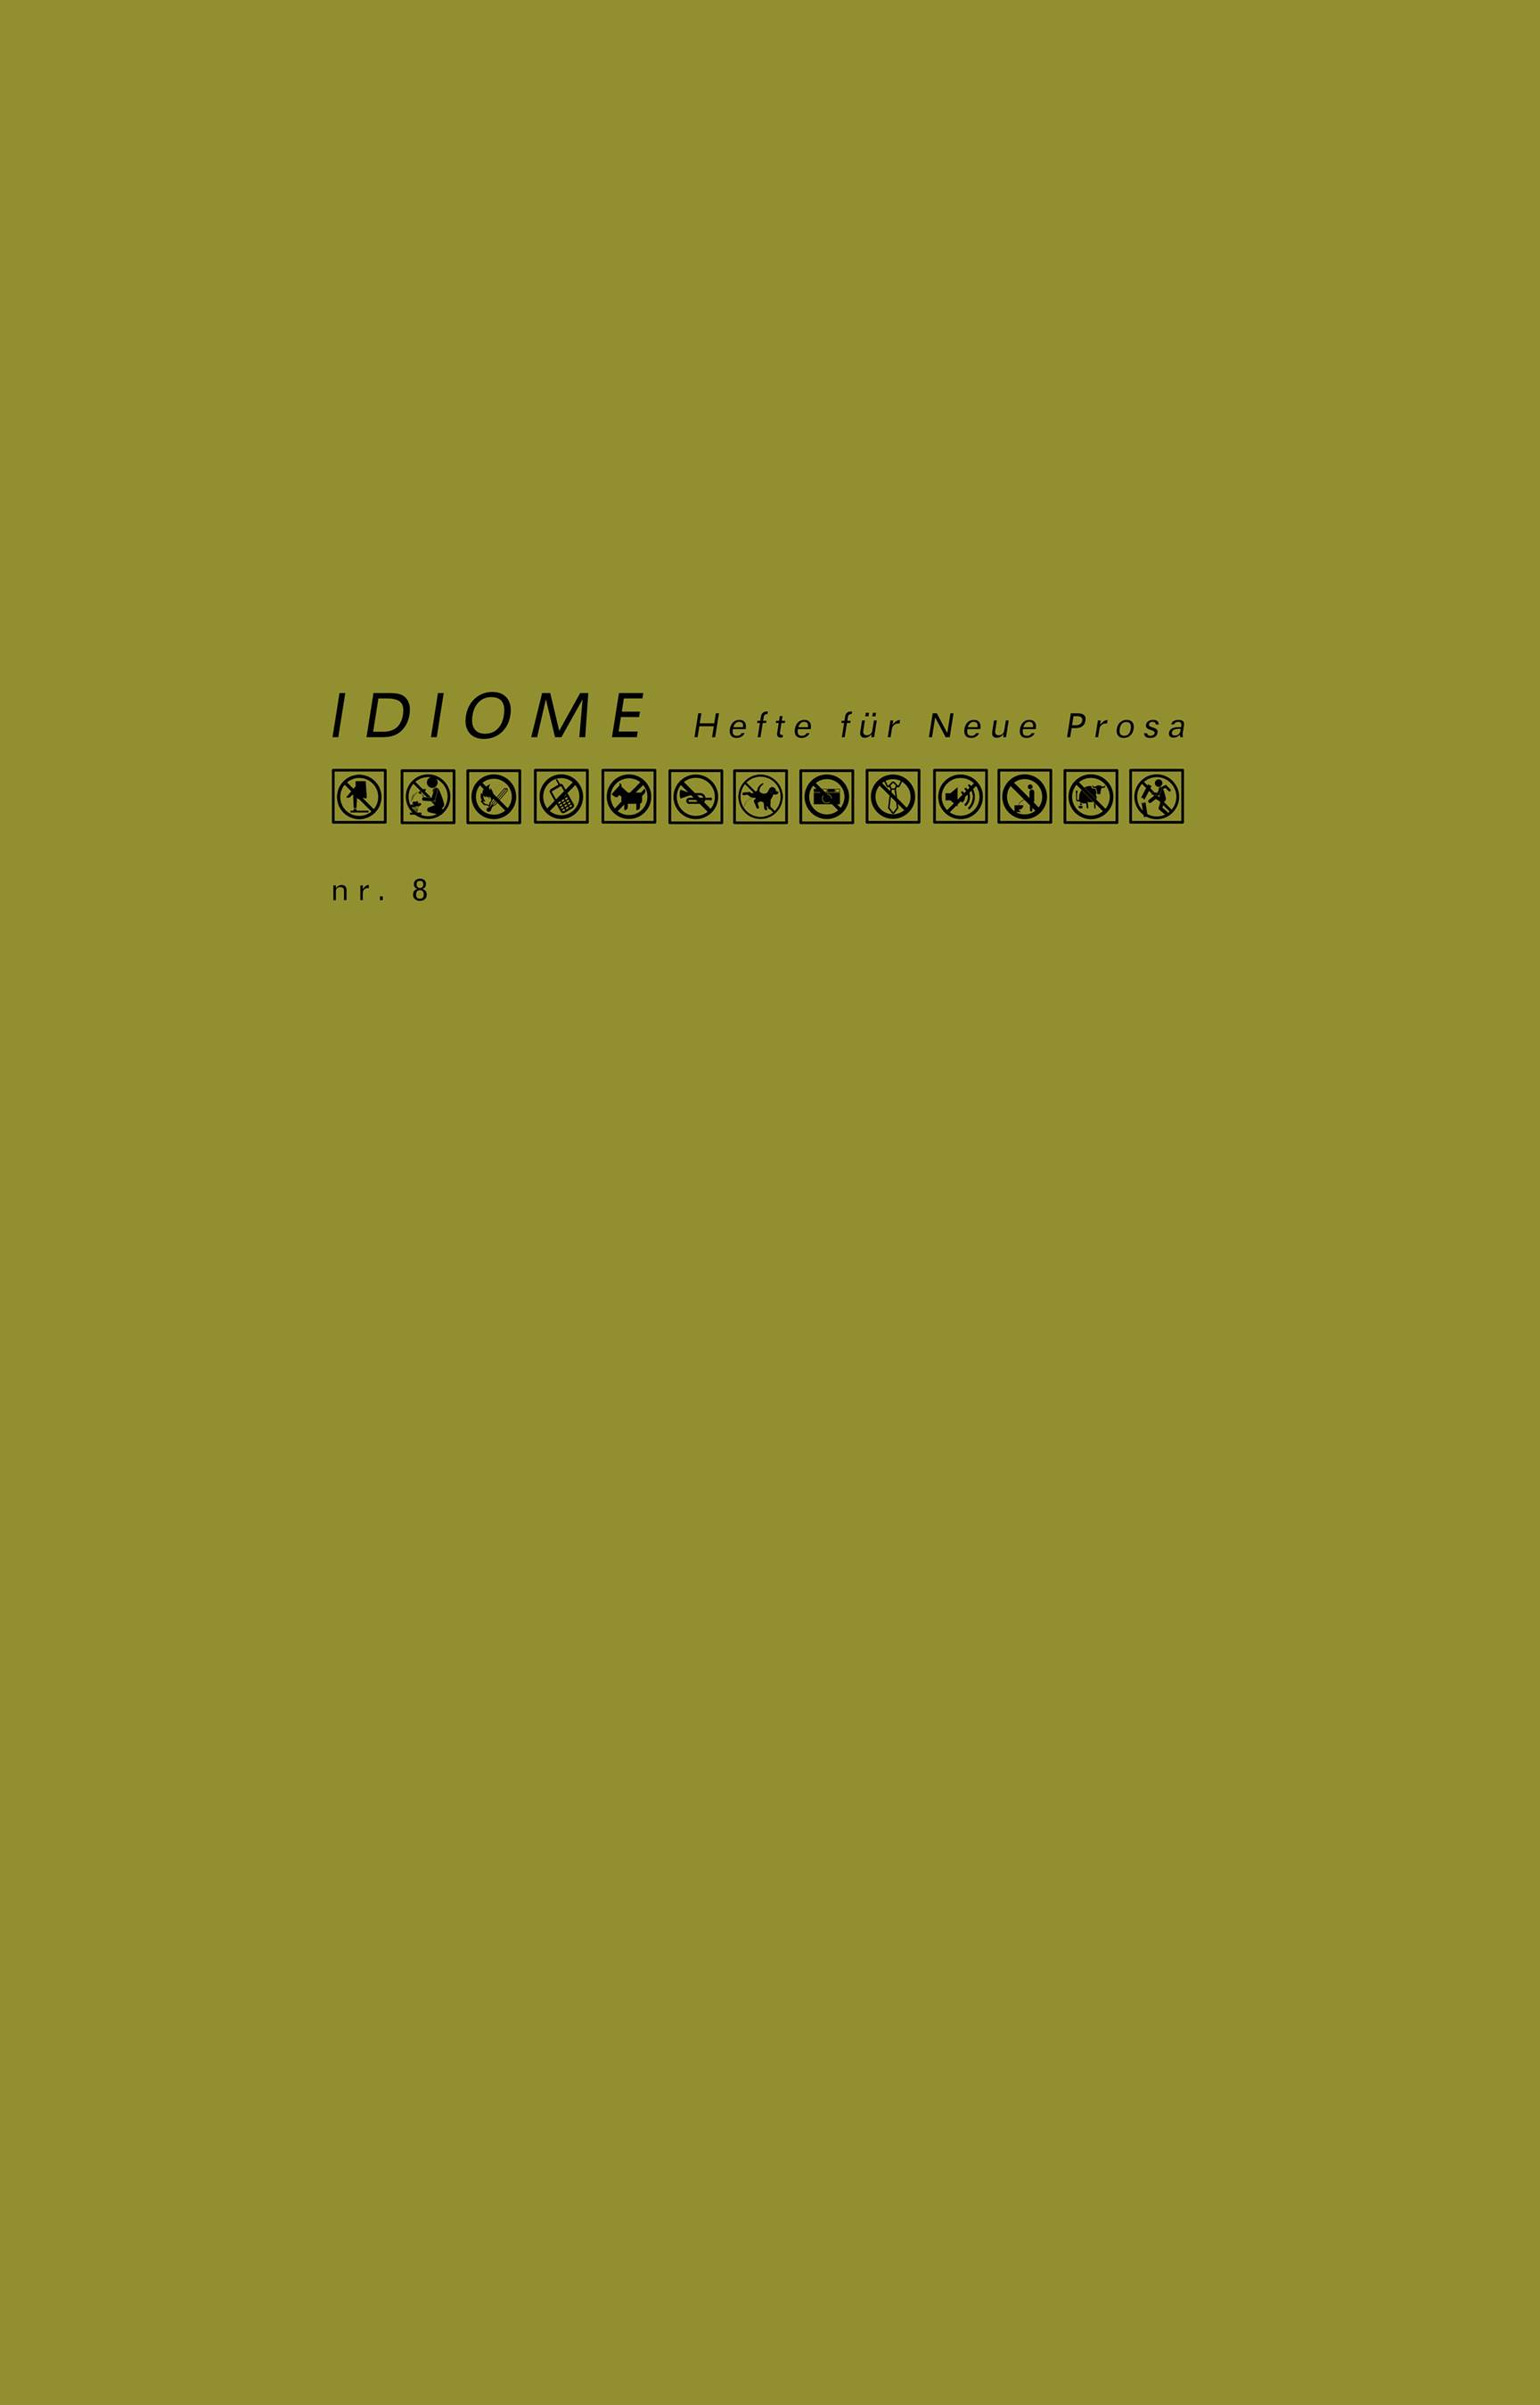 Idiome Hefte für Neue Prosa nr.8